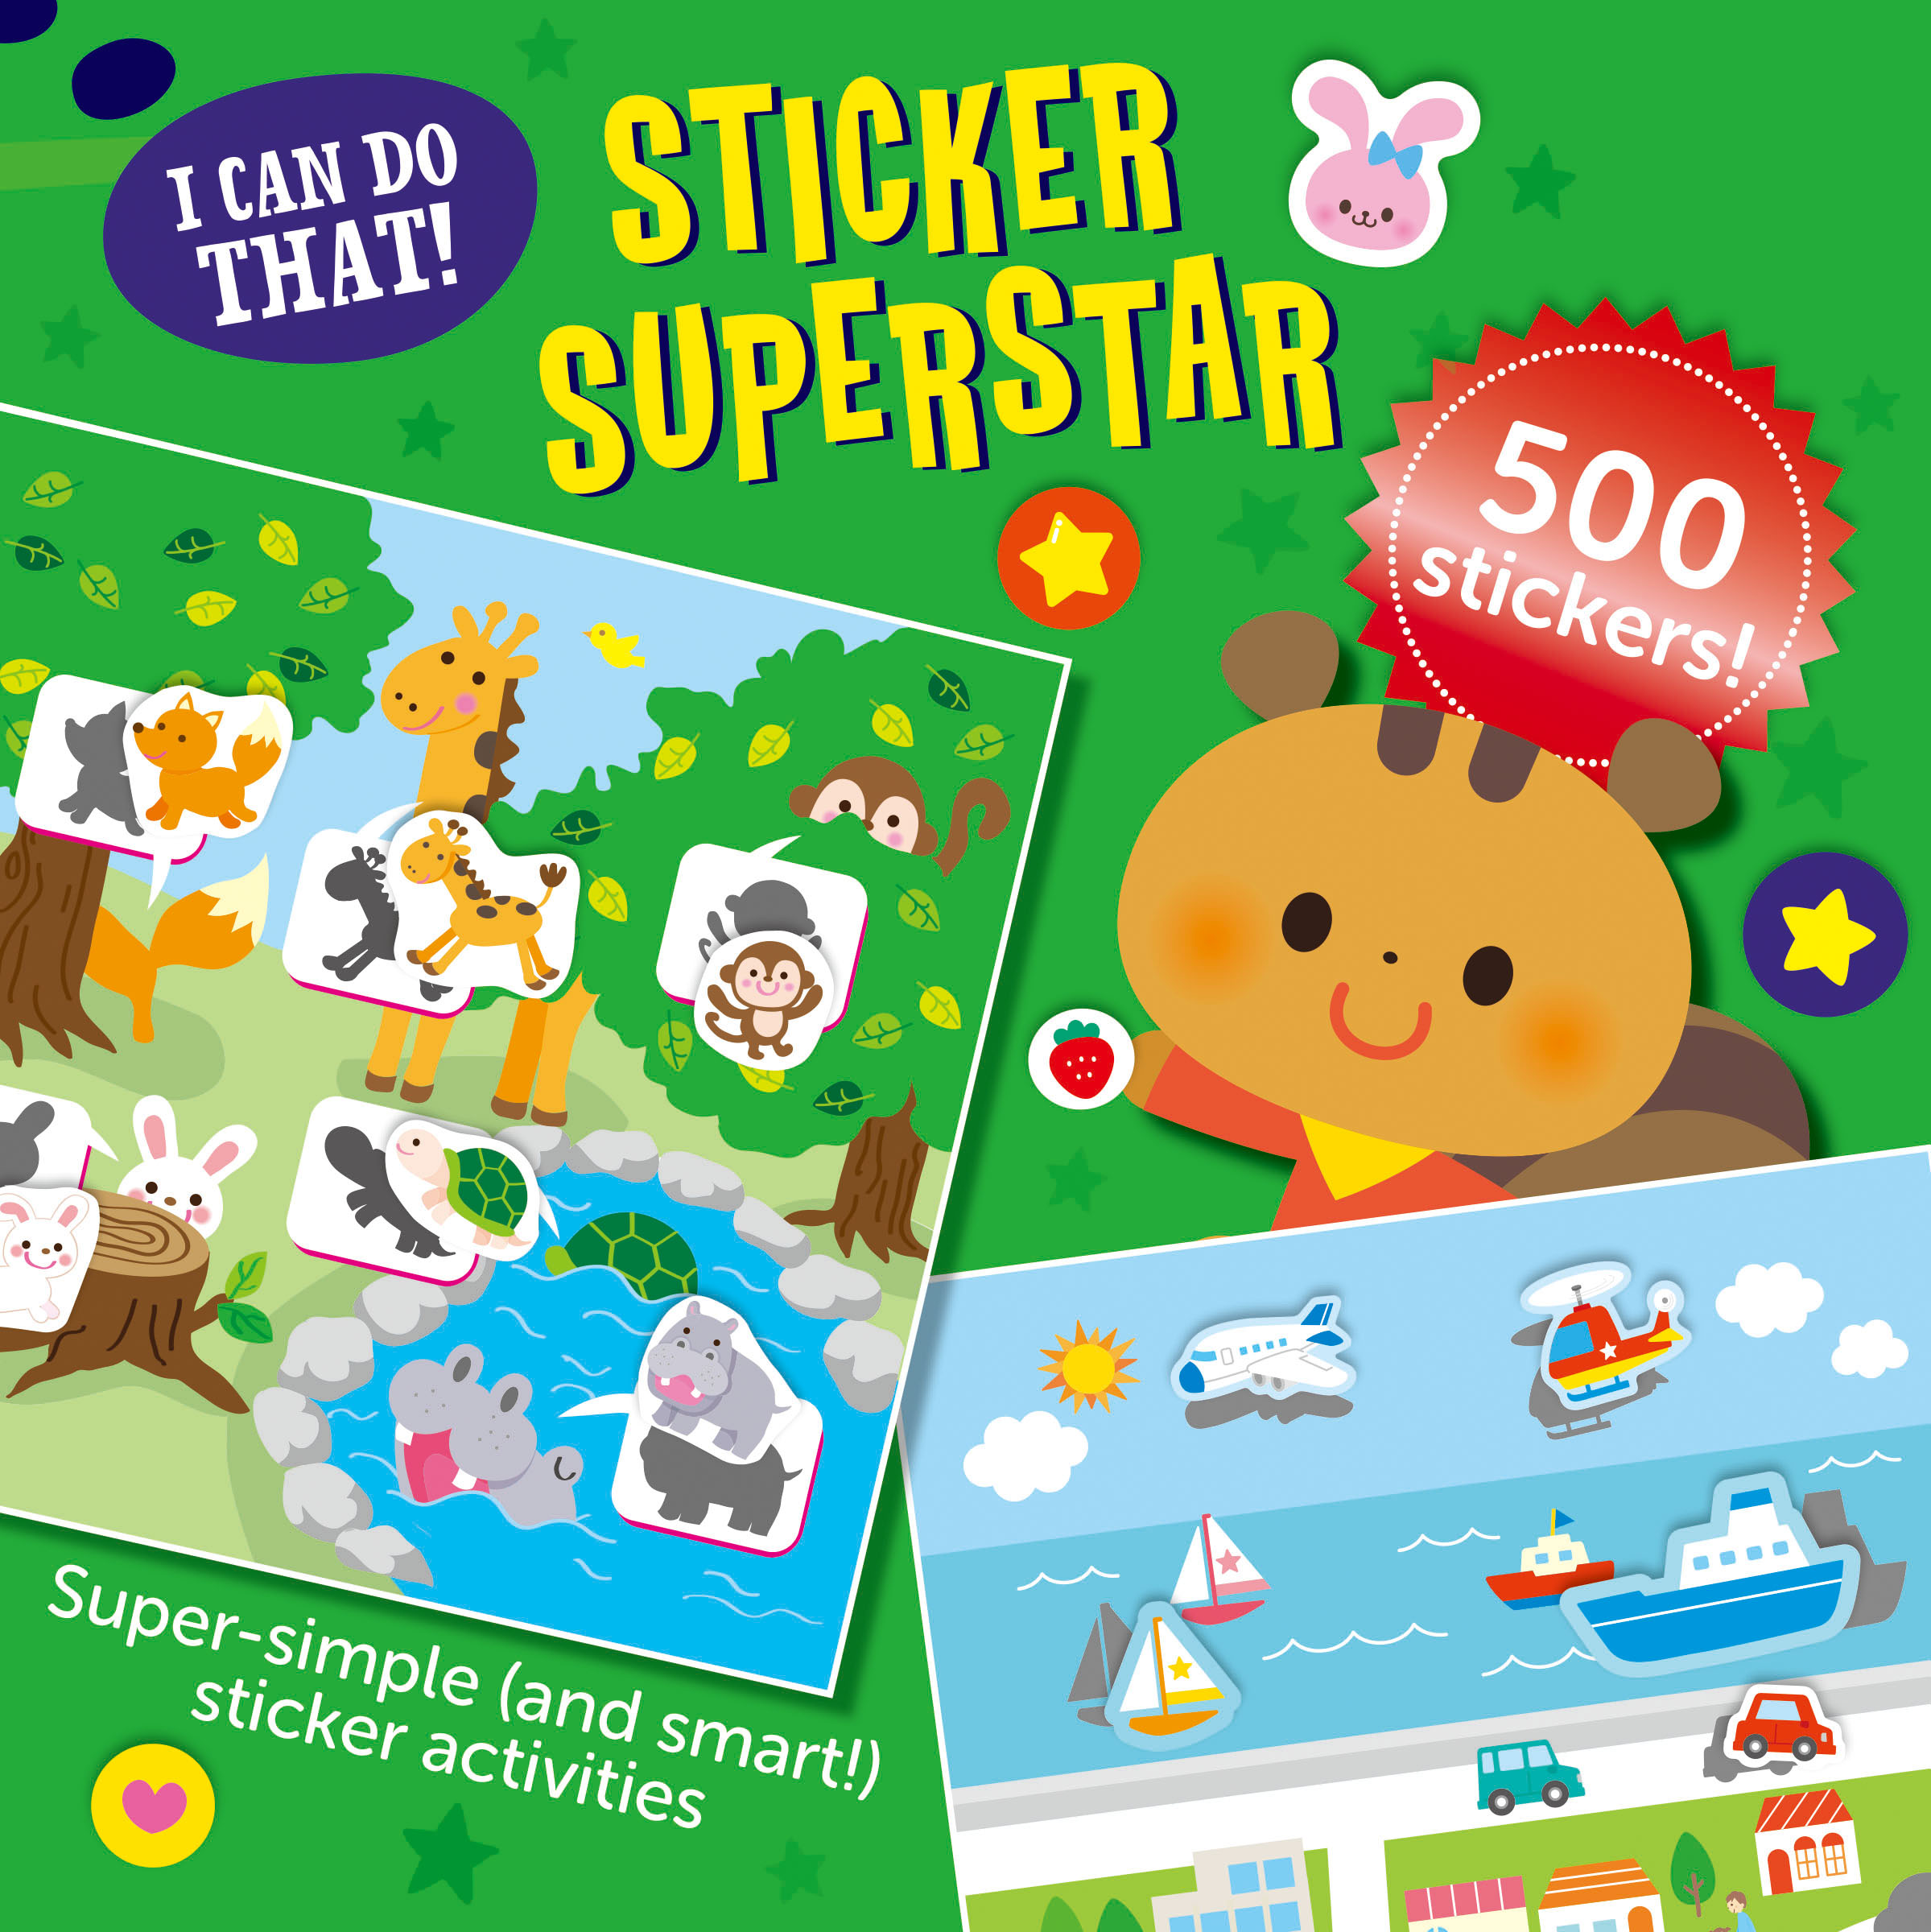 I CAN DO THAT! Sticker Superstar